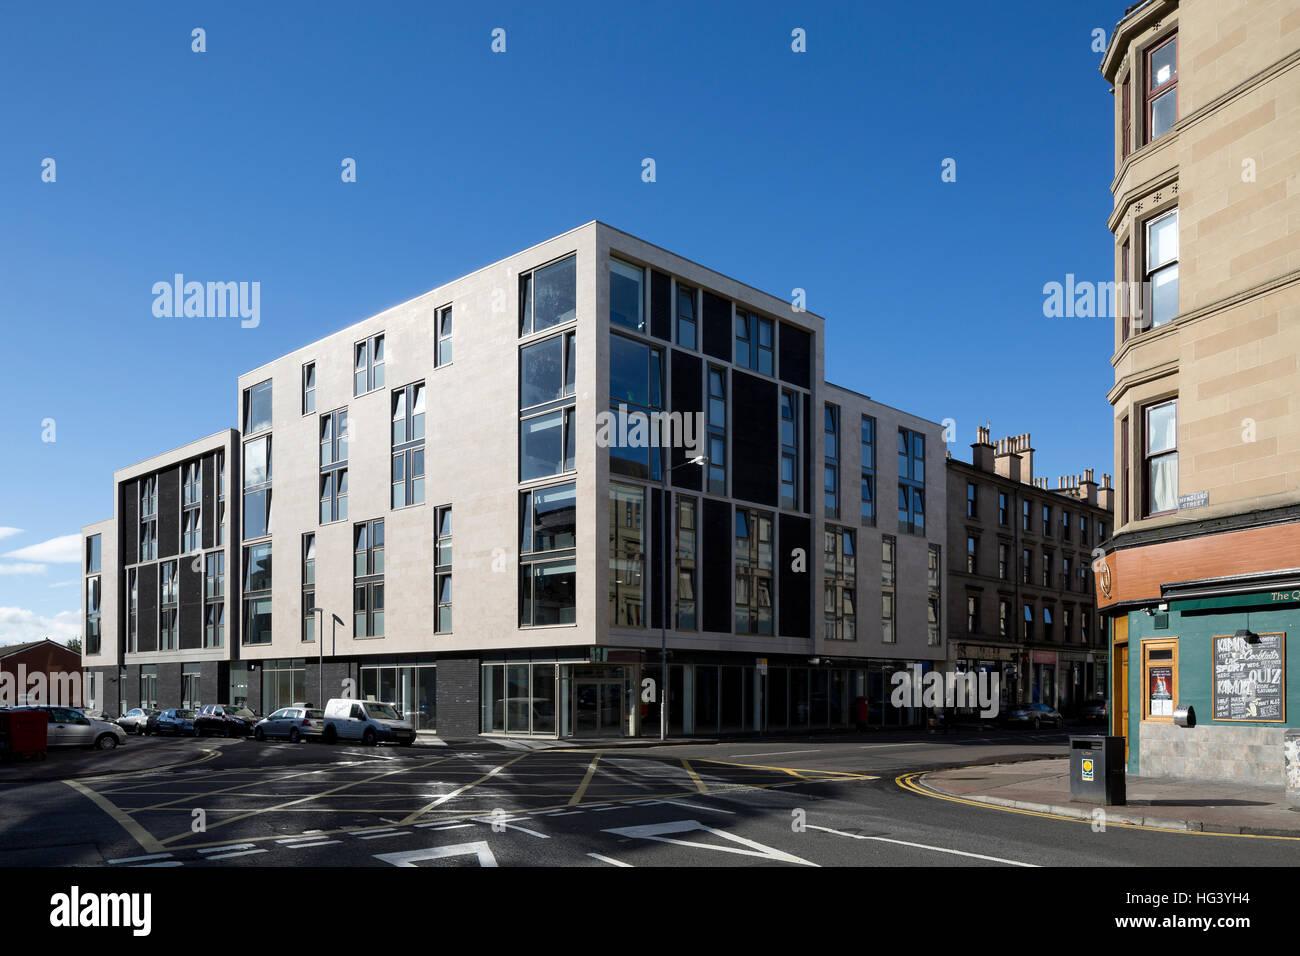 Hyndland House Student Accommodation, Partick, Glasgow, Scotland, UK. Exterior view. - Stock Image